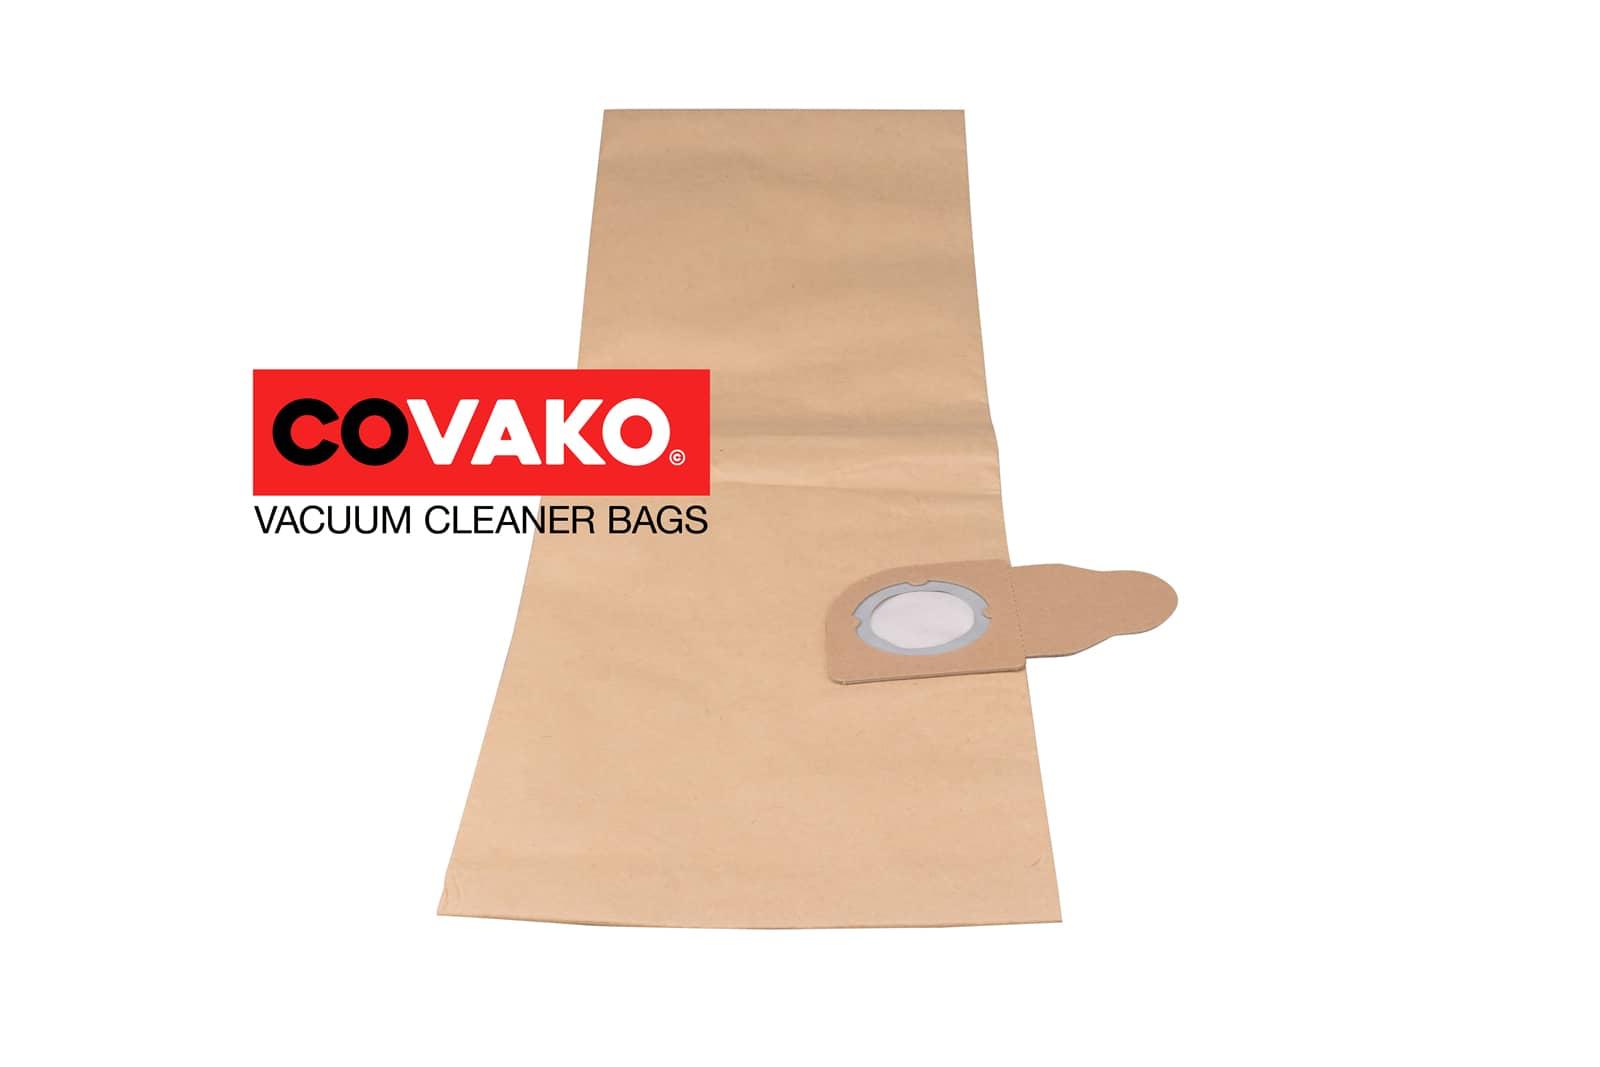 Nilfisk Aero 640 / Papier - Nilfisk stofzuigerzakken